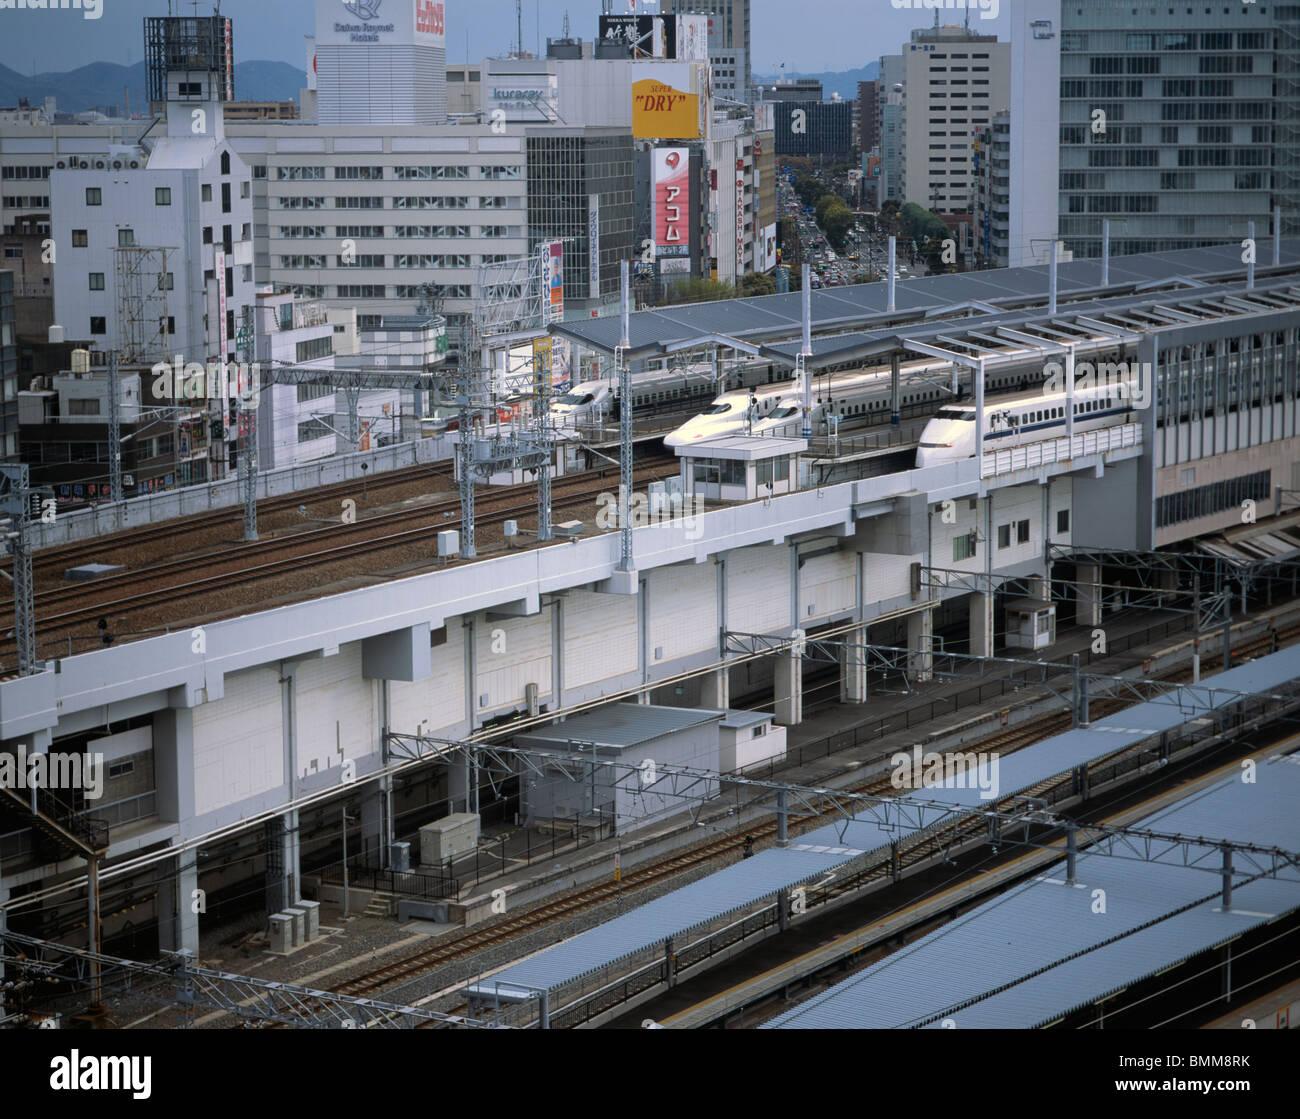 Shinkansen Bullet Trains Okayama Station Japan - Stock Image